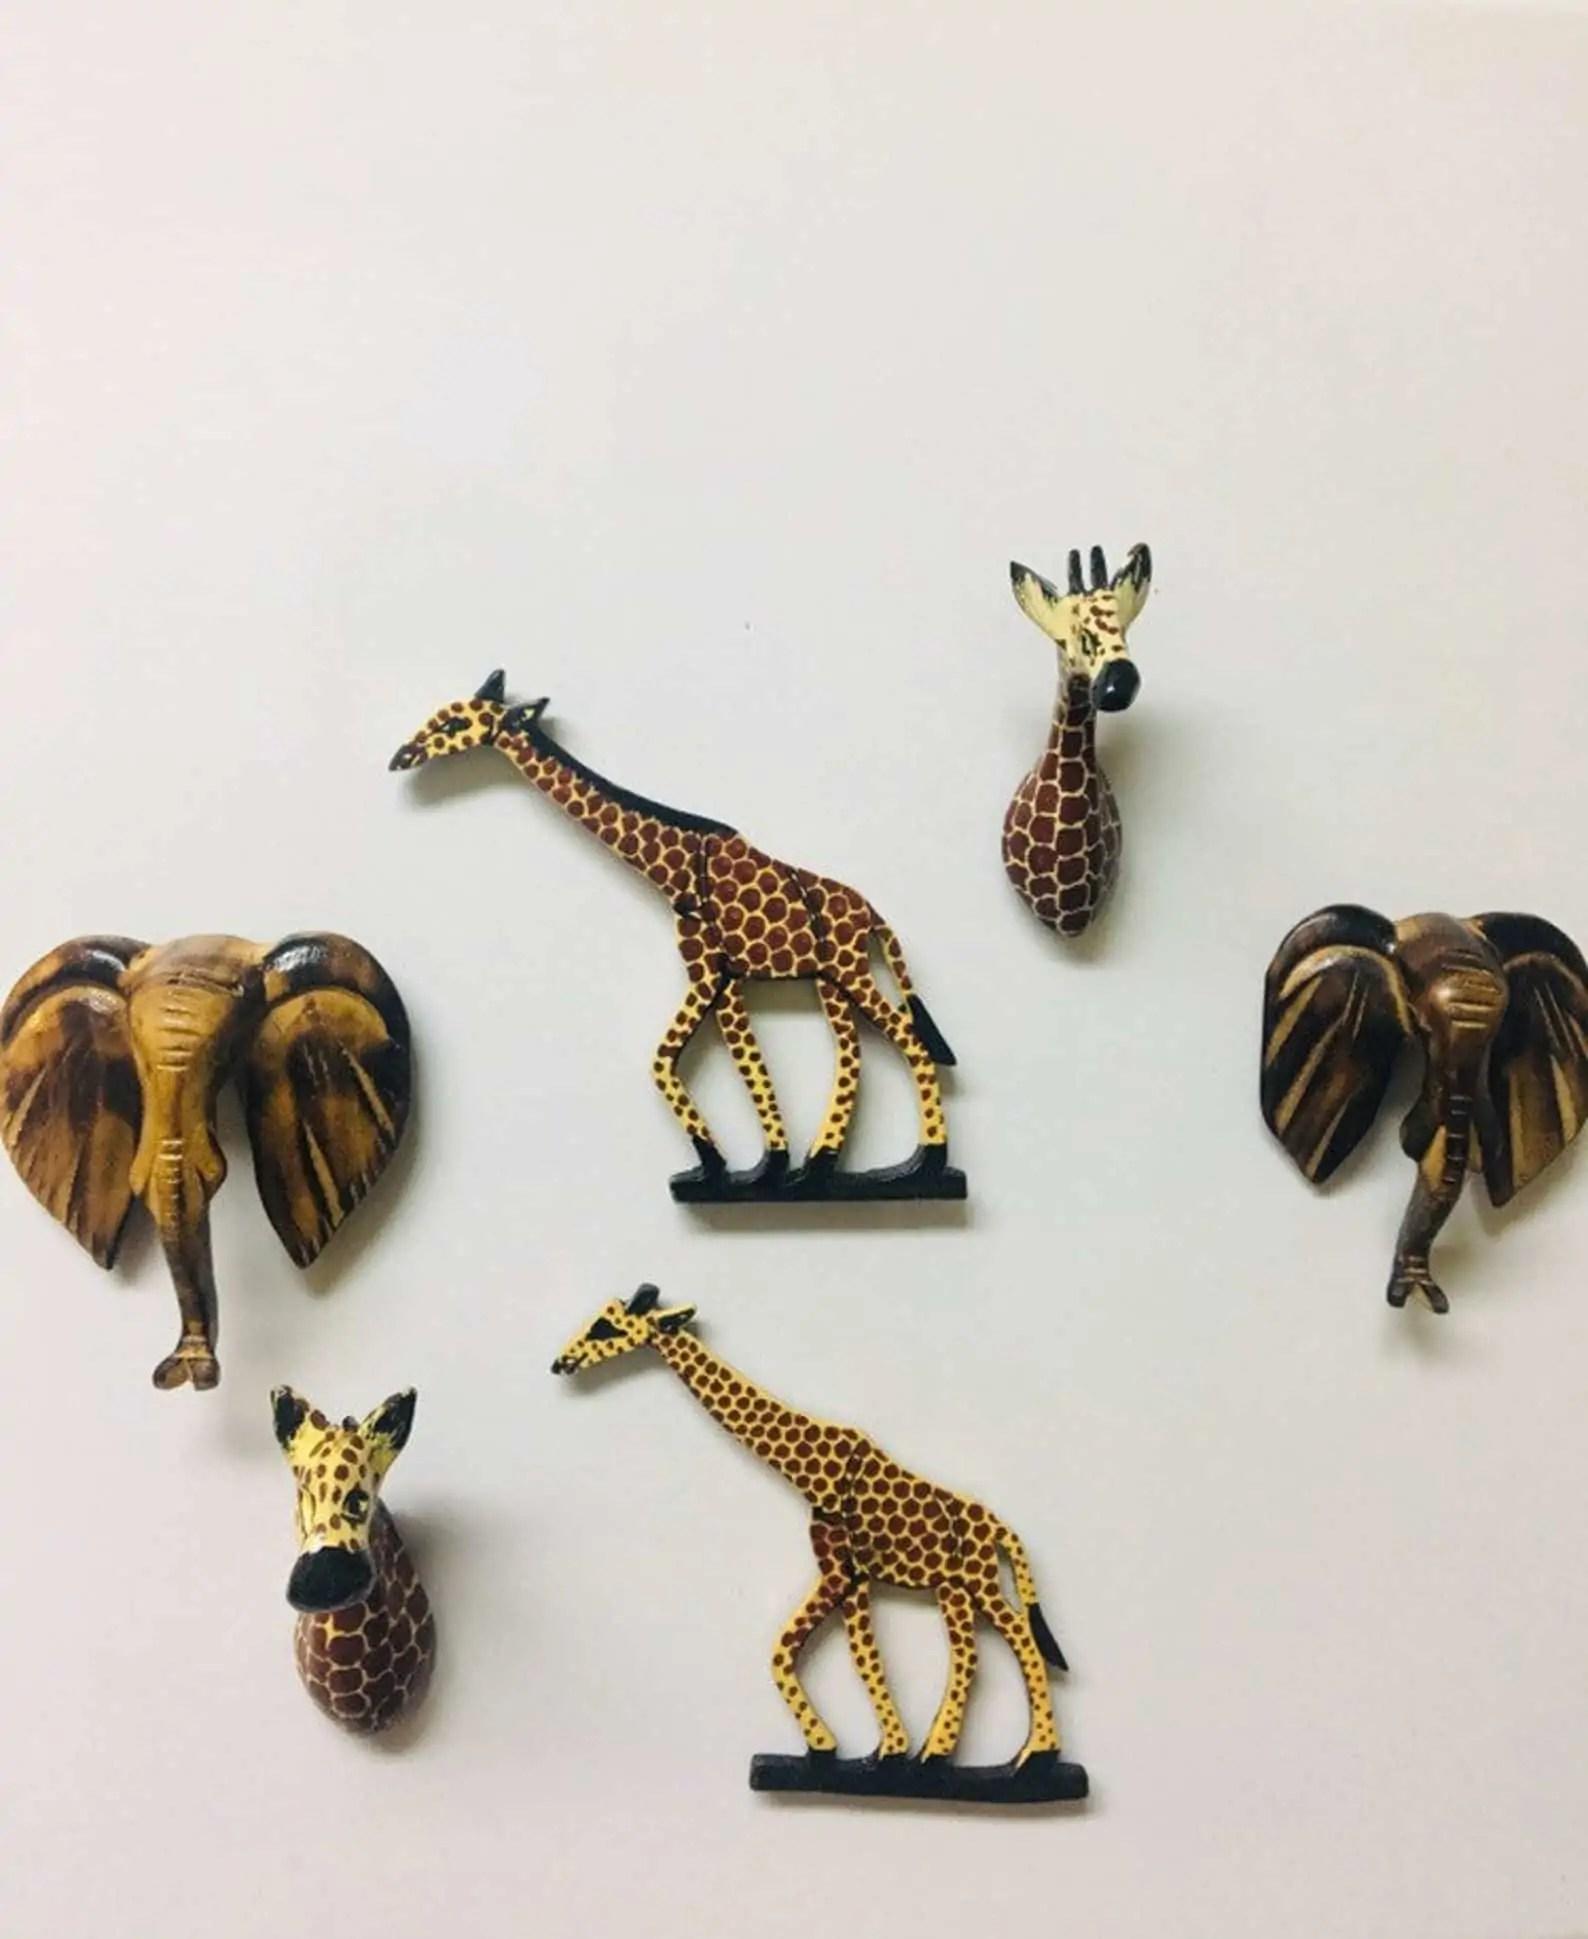 Etsy Shop BaskArts | Fridge Magnets of African Animals